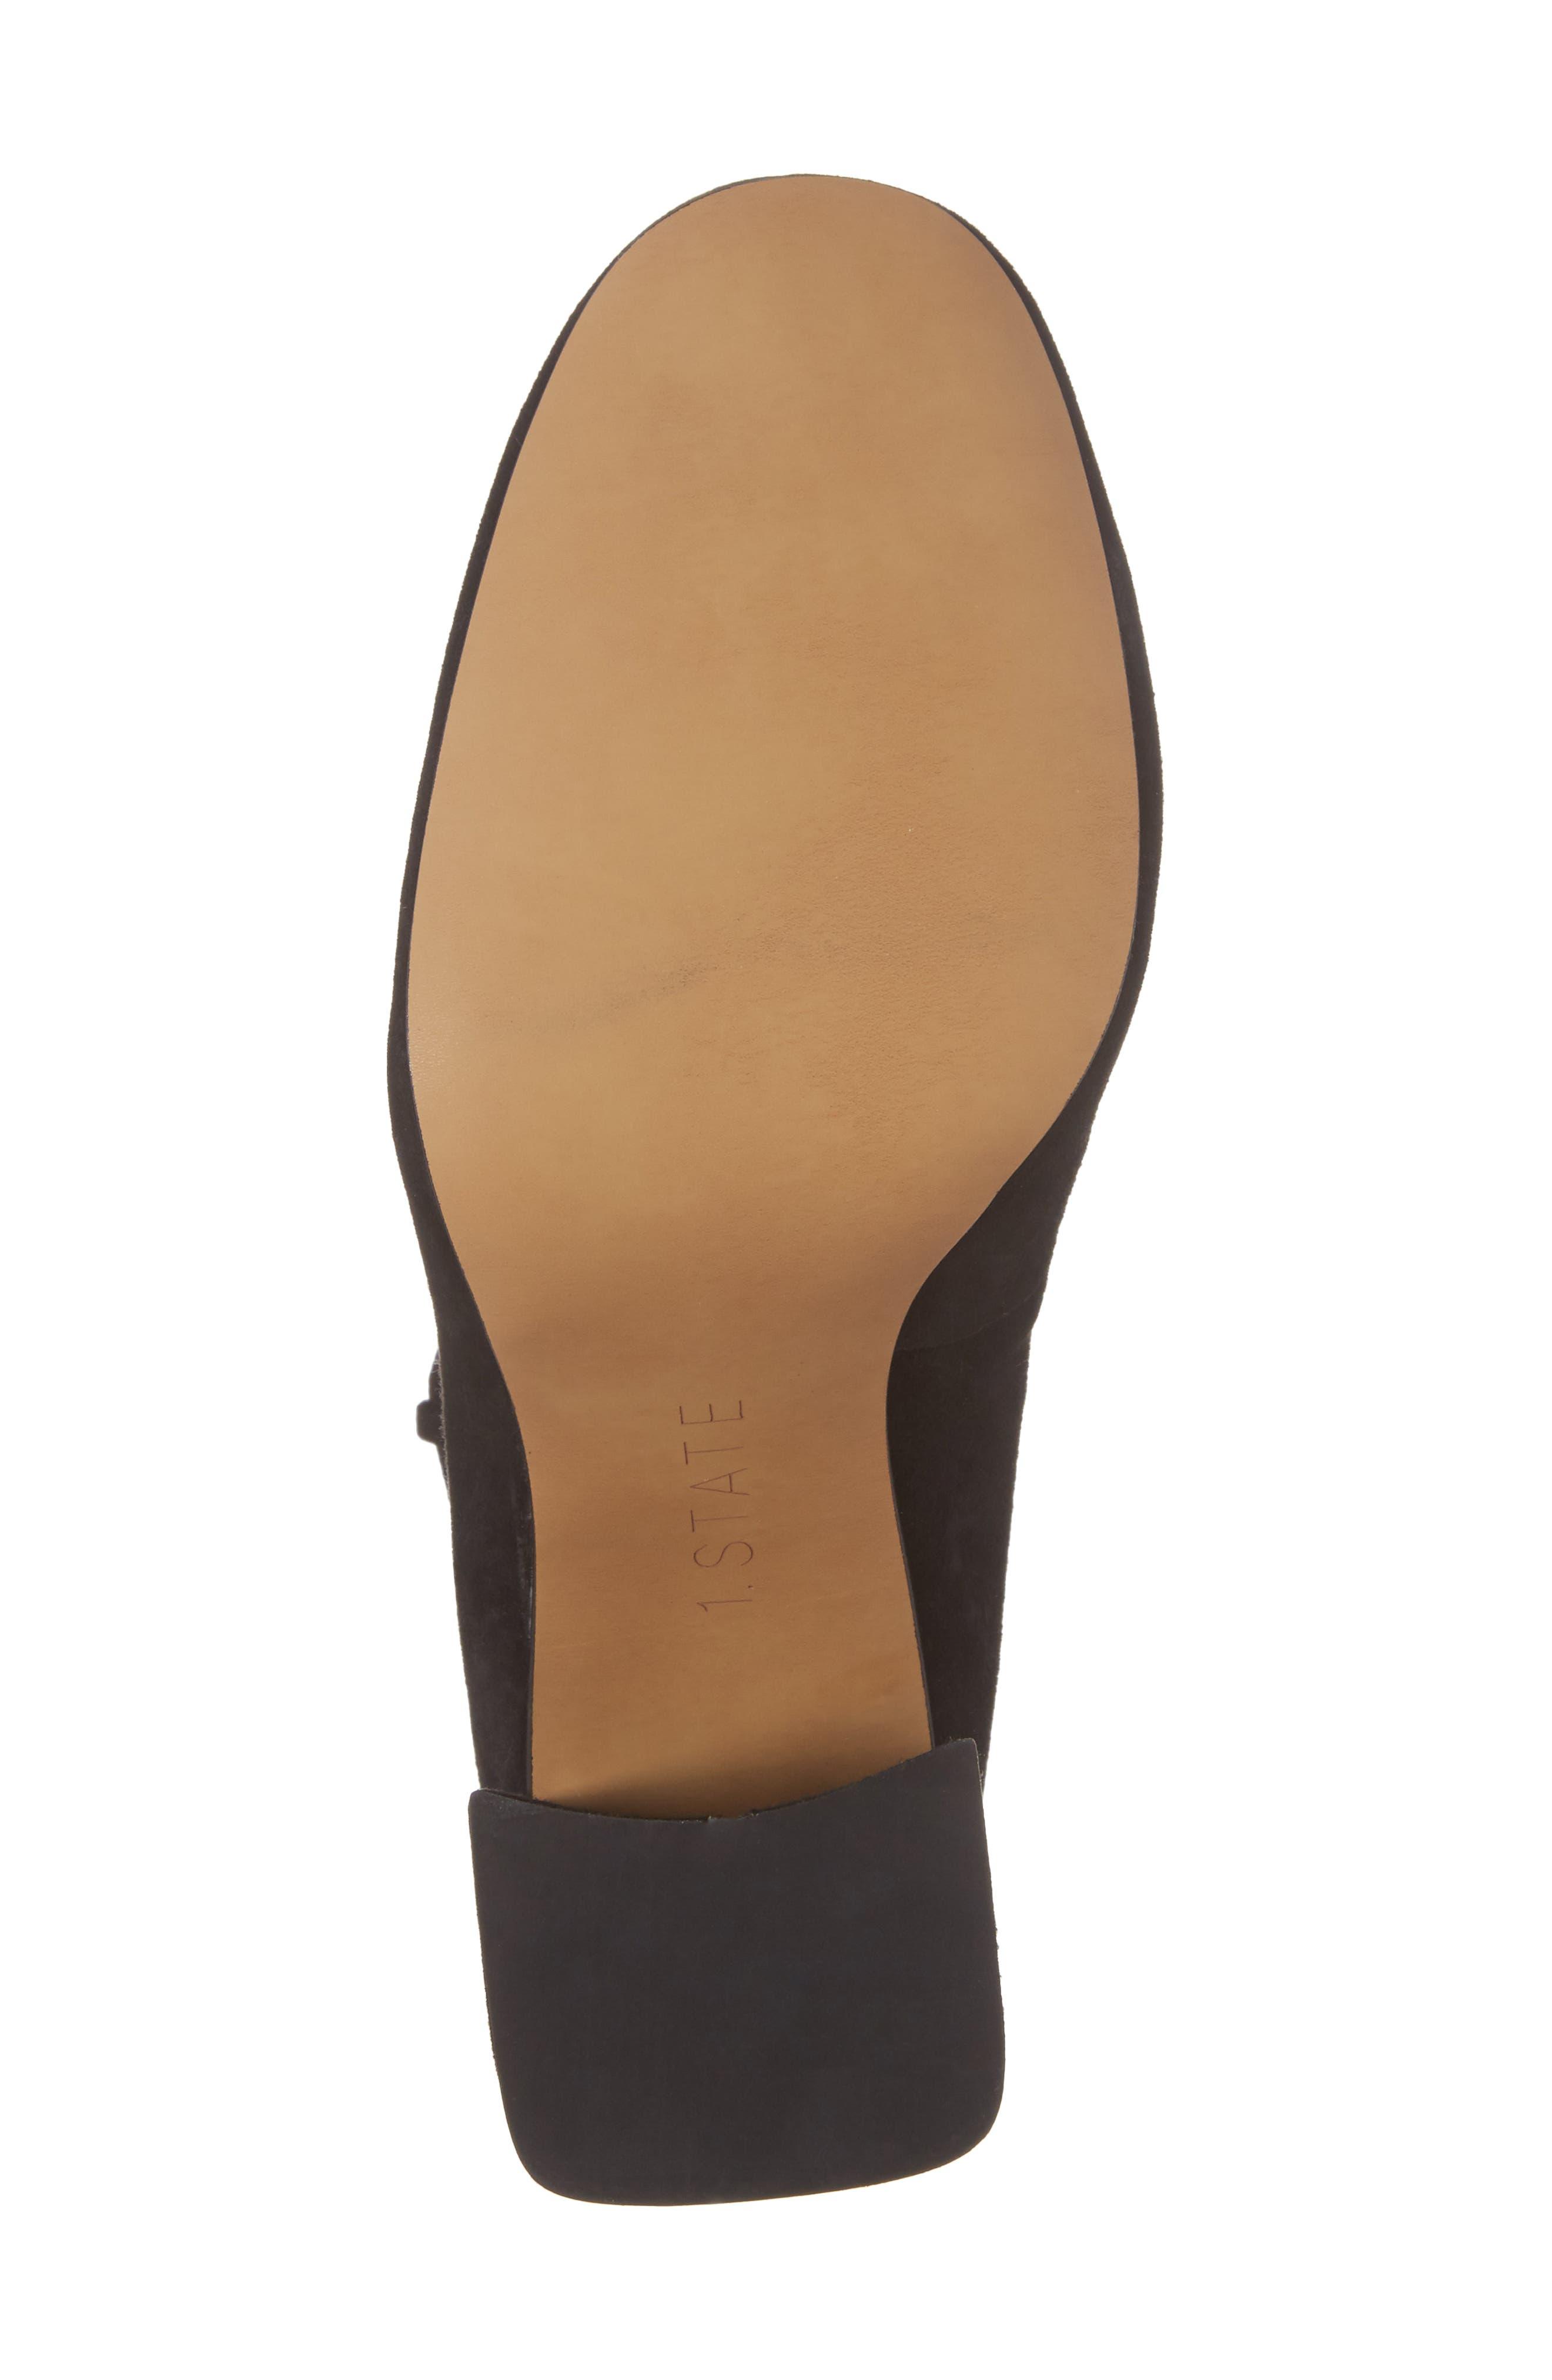 Makal Flared Heel Wraparound Pump,                             Alternate thumbnail 6, color,                             001